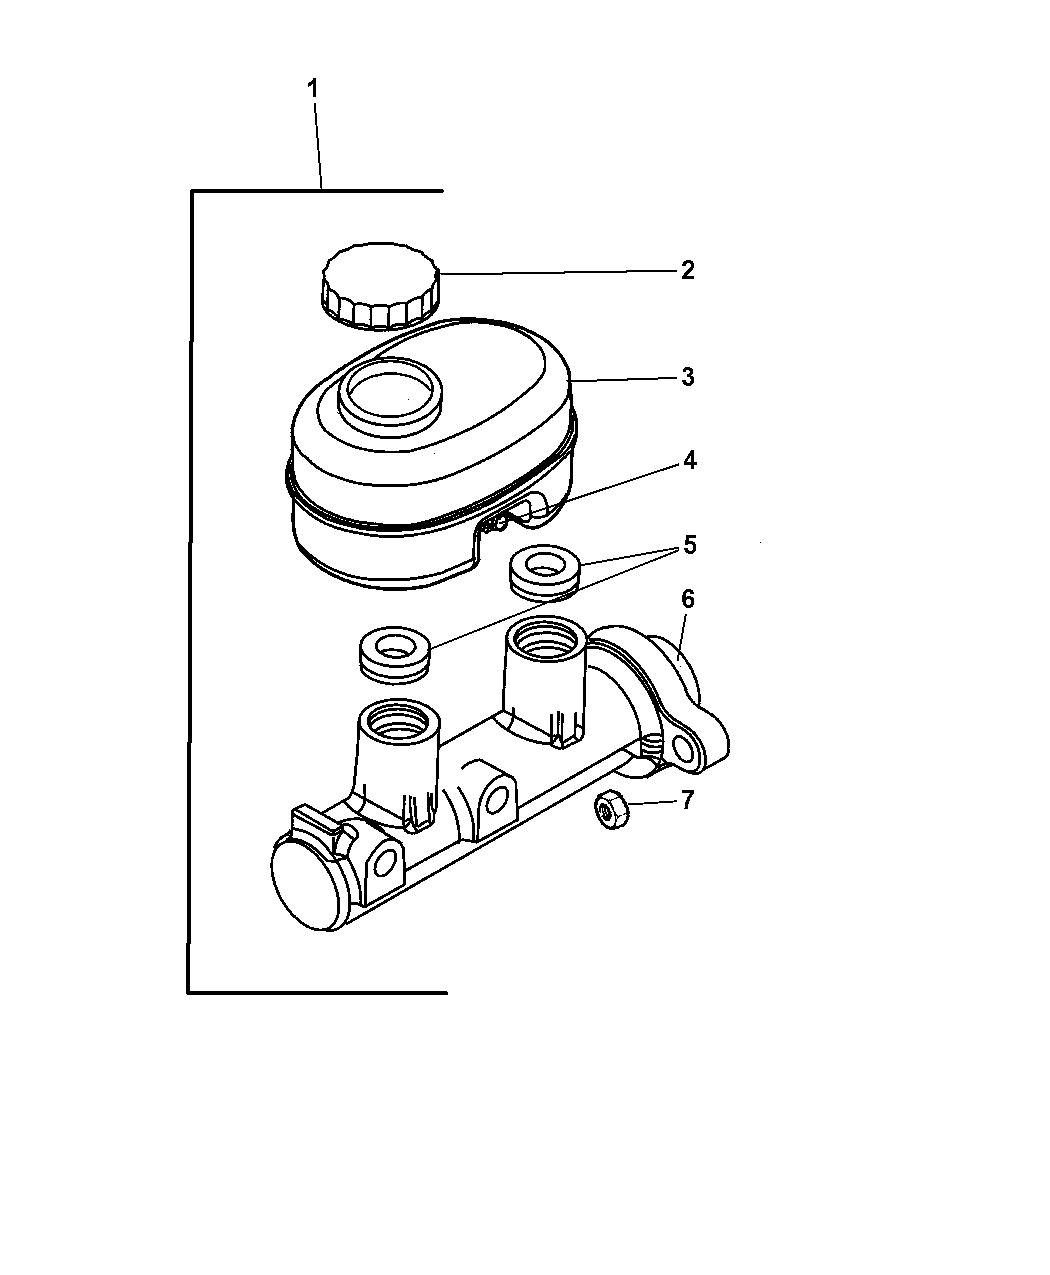 1999 Dodge Ram 3500 Quad Club Cab Brake Master Cylinder Car Fuel Pump Diagram